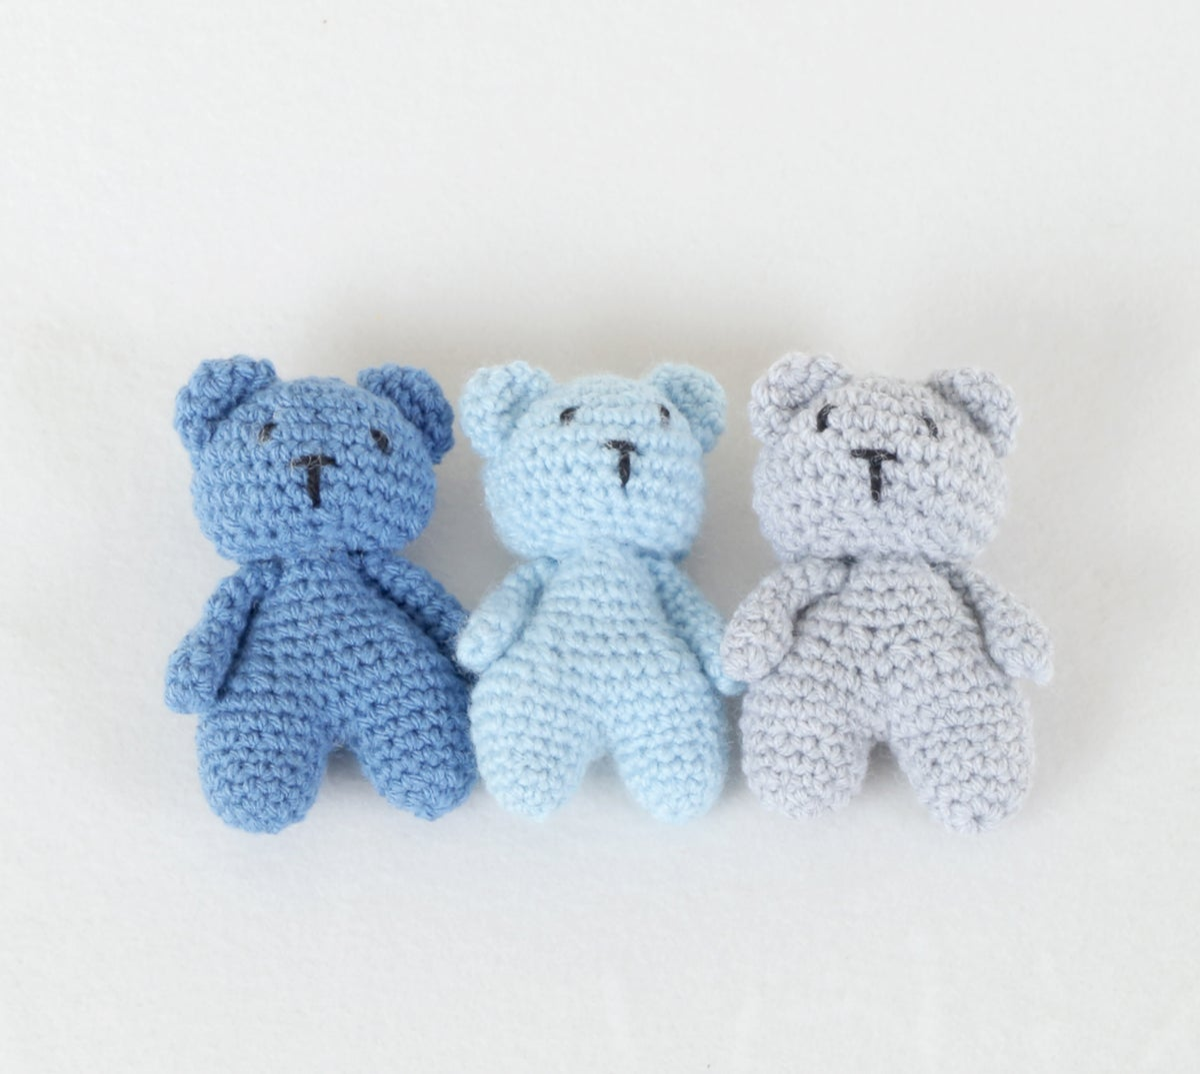 Newborn Teddy Bears - Set of 3 (Boys)